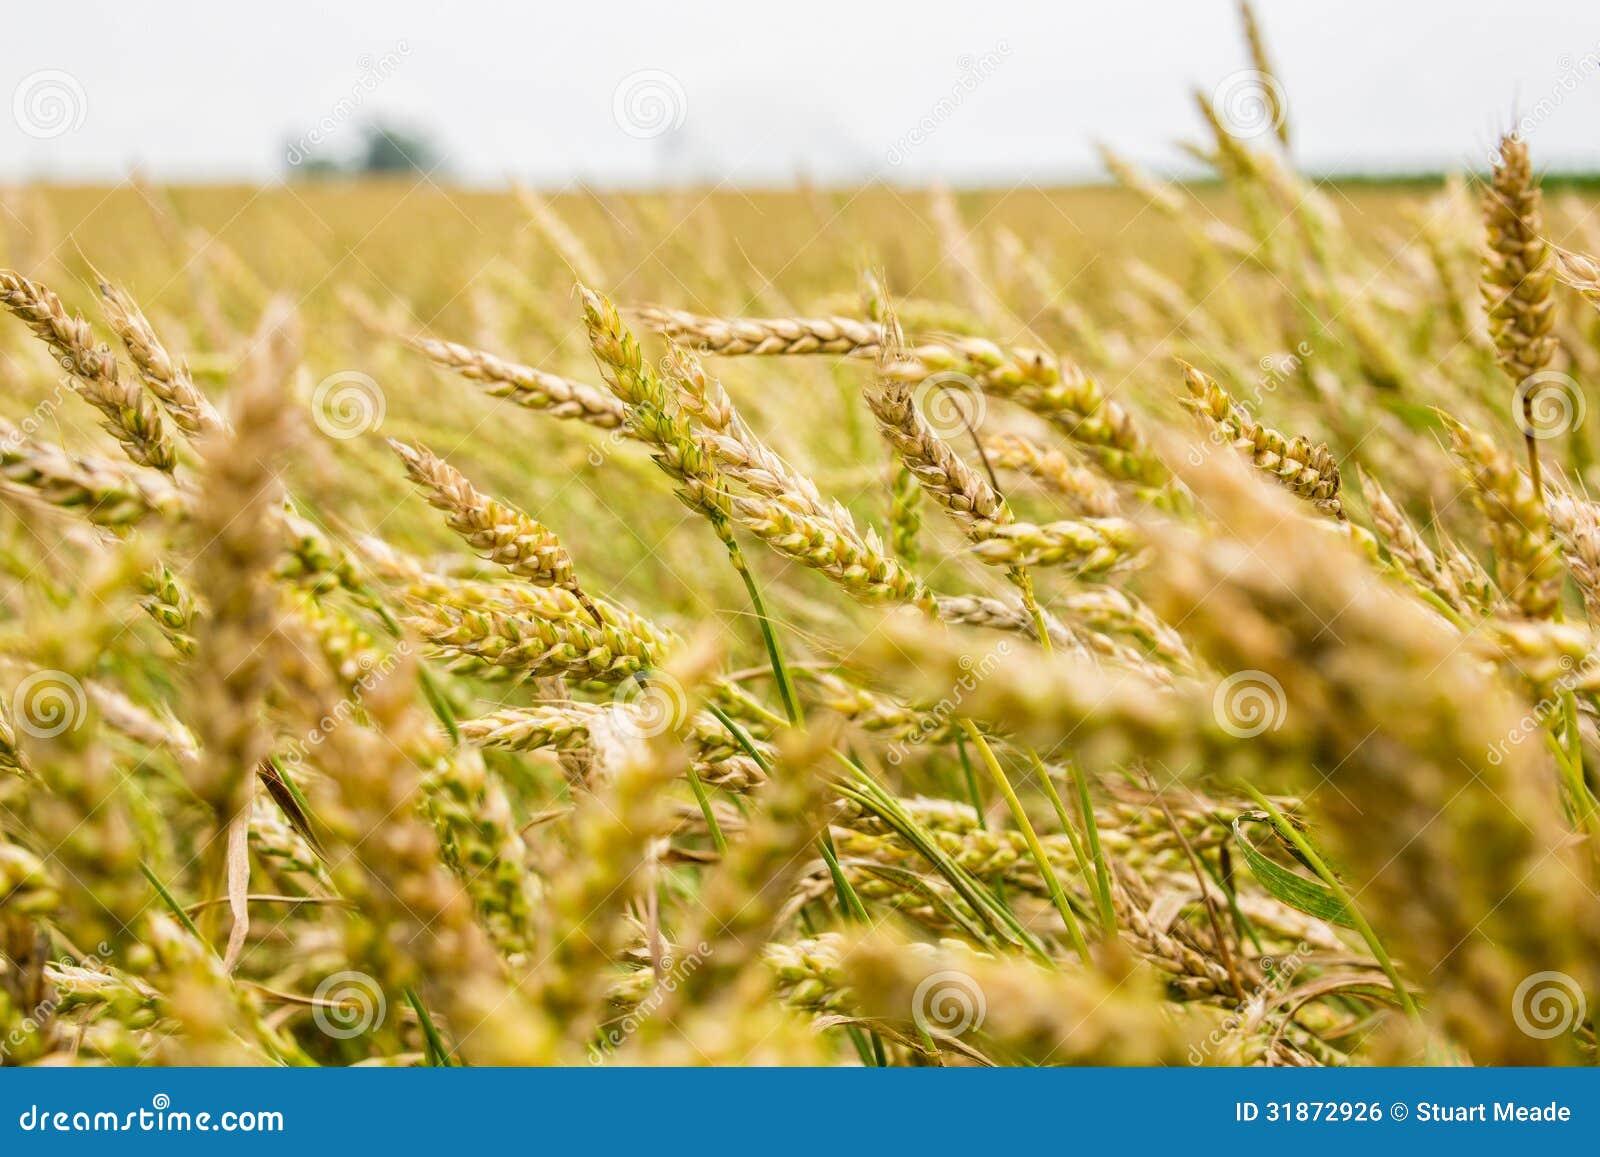 Wheat Farm Field Royalty Free Stock Image Image 31872926